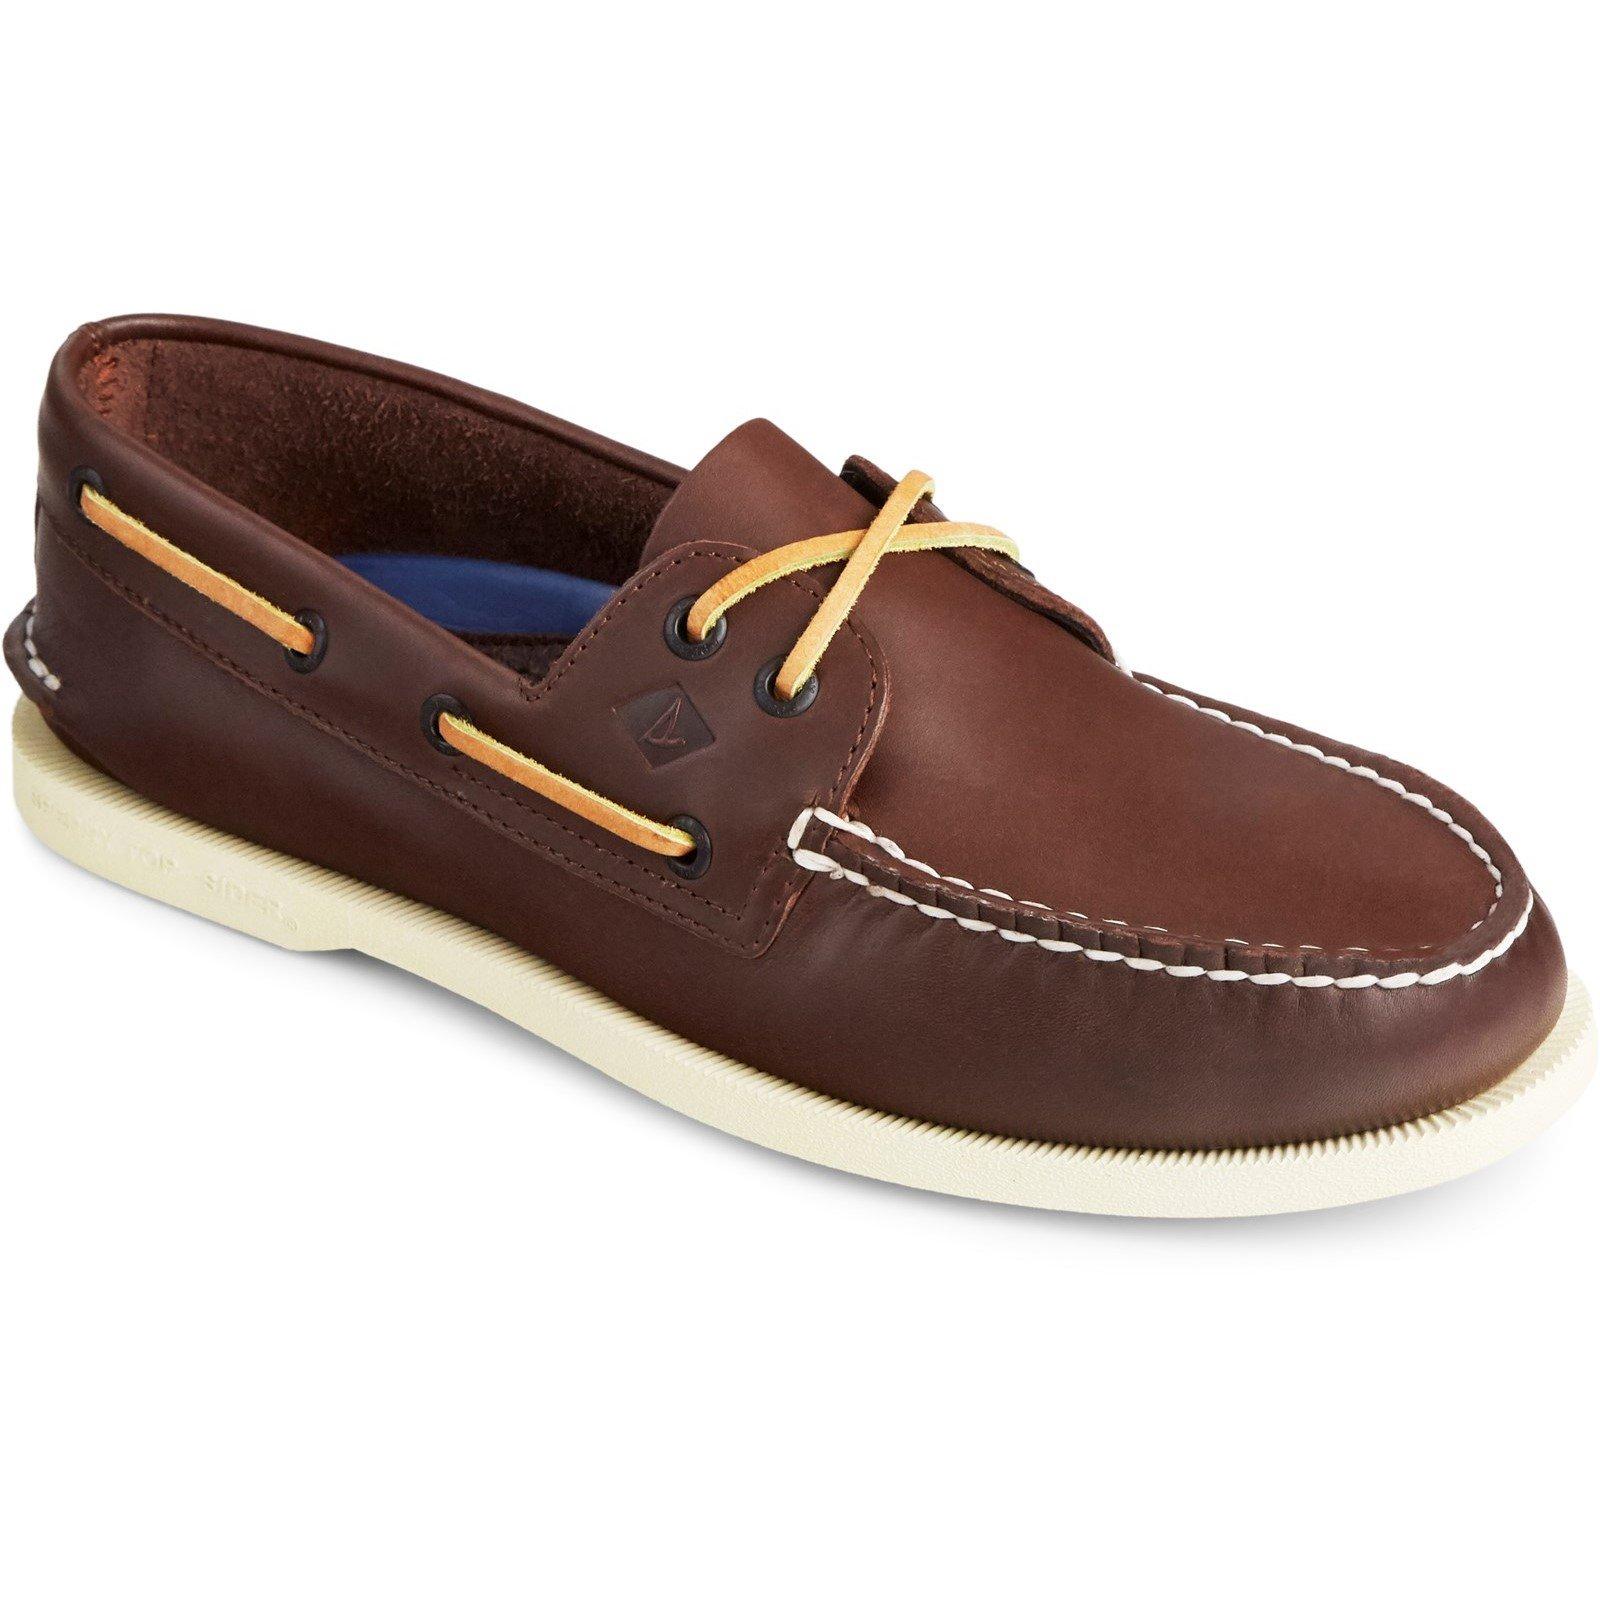 Sperry Men's Authentic Original Leather Boat Shoe Various Colours 31524 - Brown 9